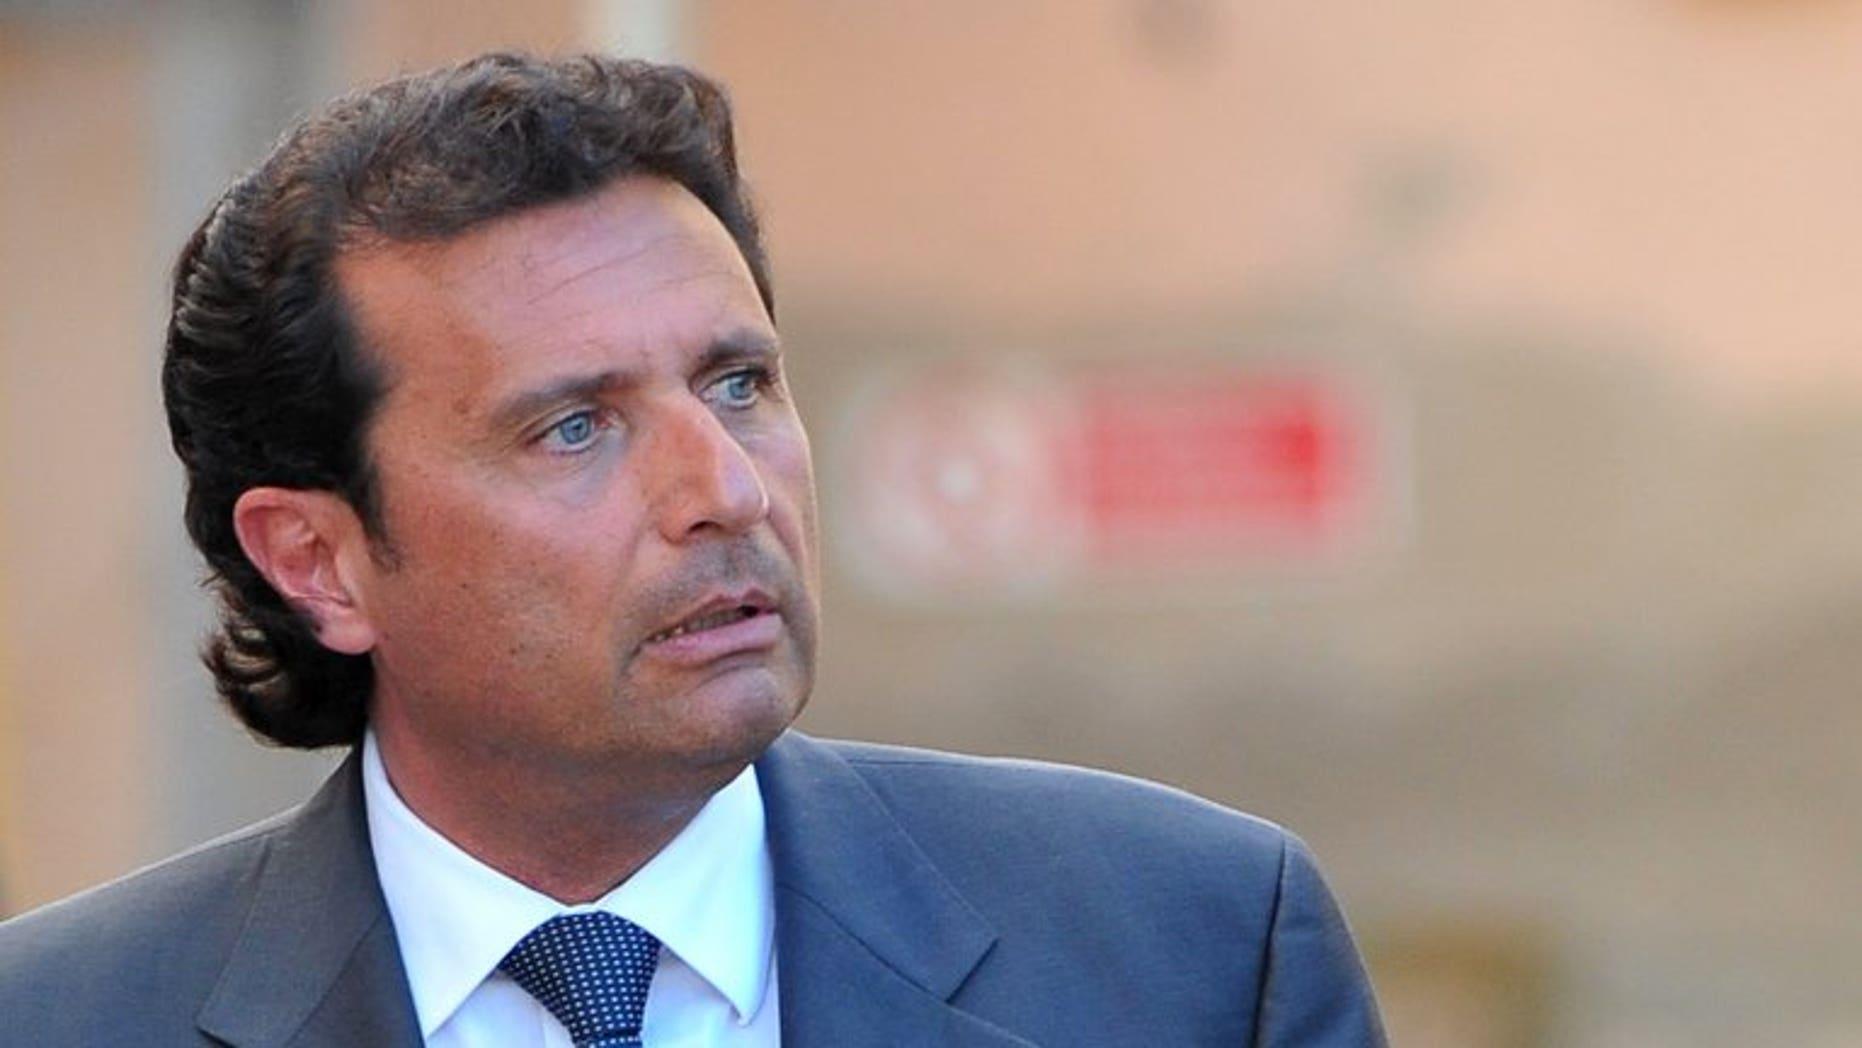 Francesco Schettino on April 15, 2013 in Grossetto. The trial of Schettino, captain of the ill-fated Costa Concordia cruise ship, began in the Italian city of Grosseto on Tuesday.